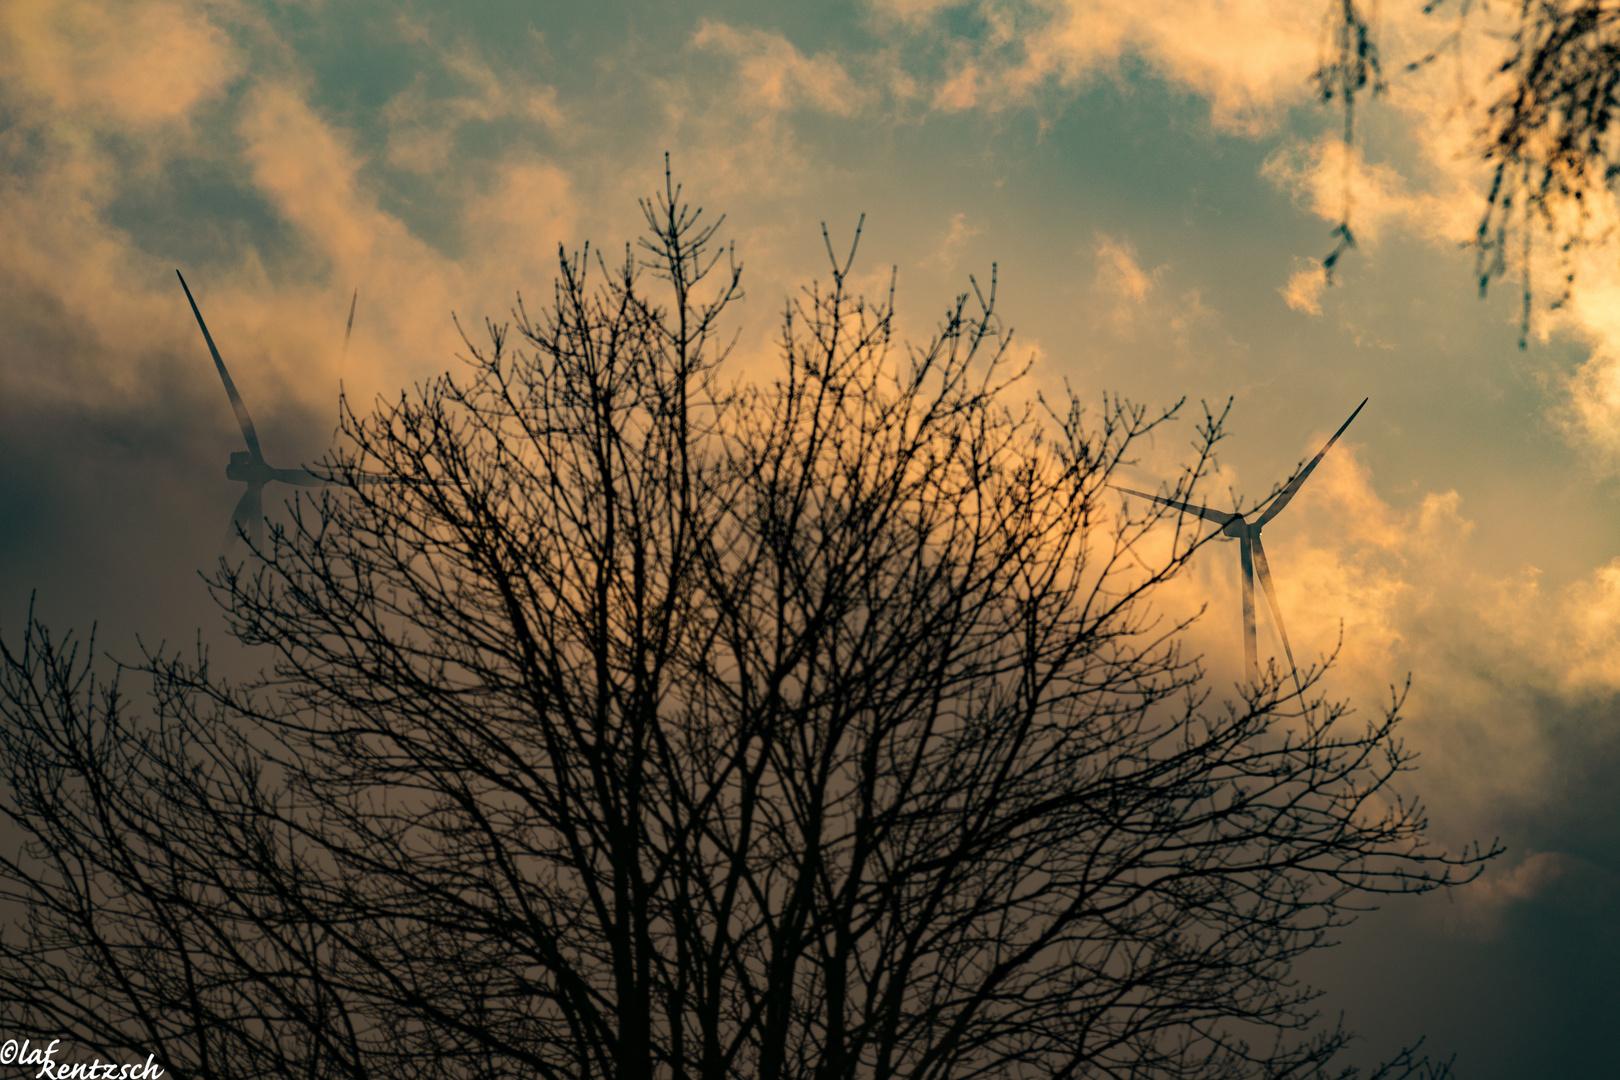 Windräder im Nebel 4